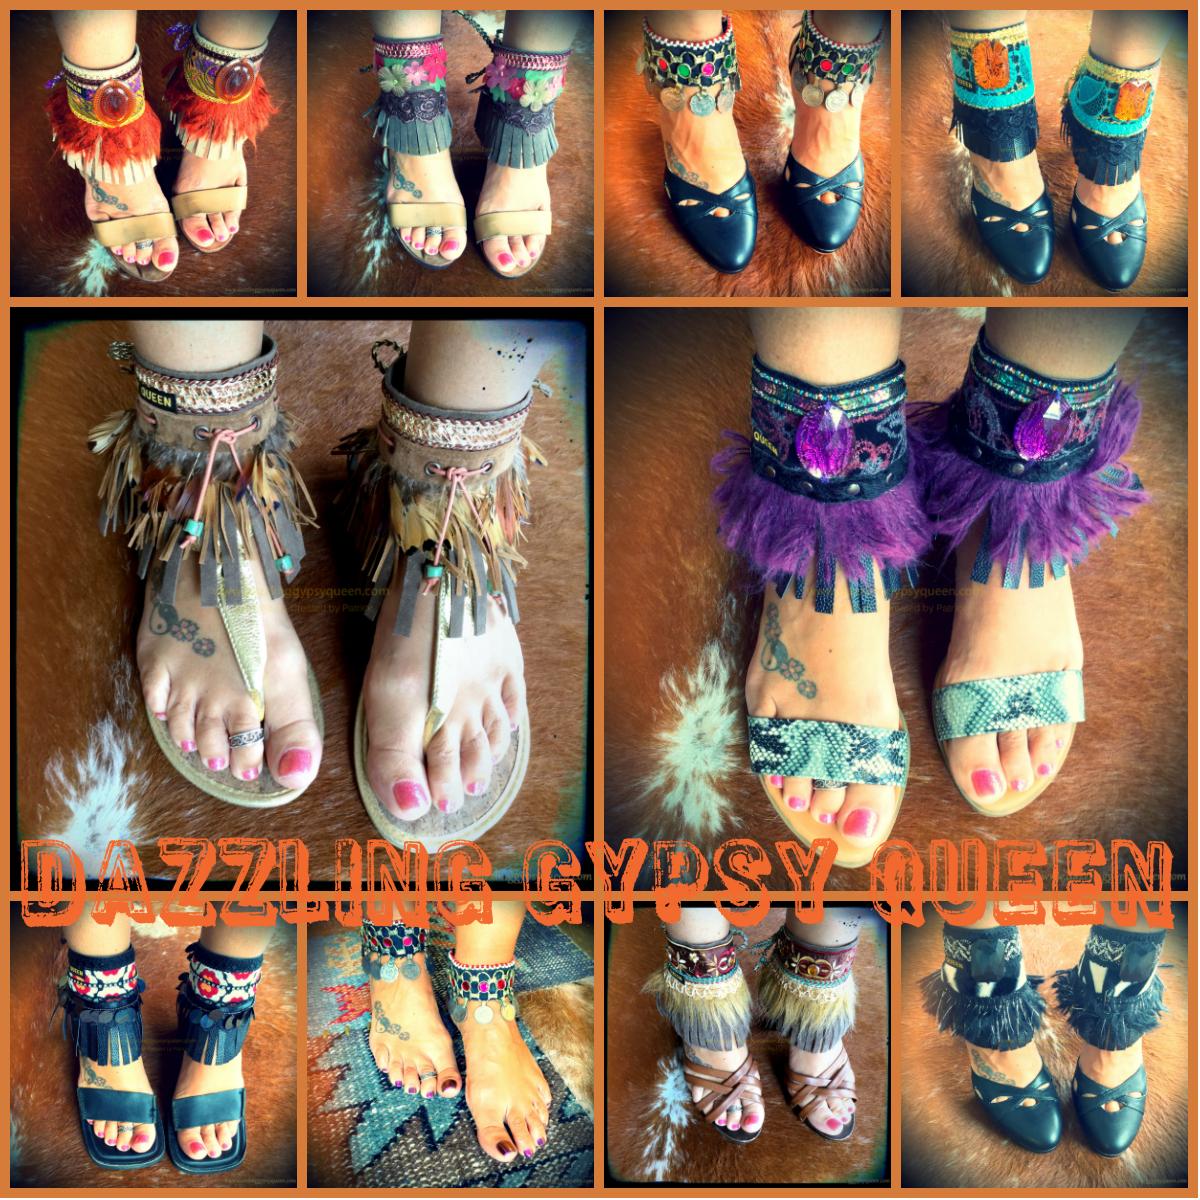 Gypsy Boho Ankle Cuffs - Ankle Belts - Sandal Cuffs - by Dazzling Gypsy Queen